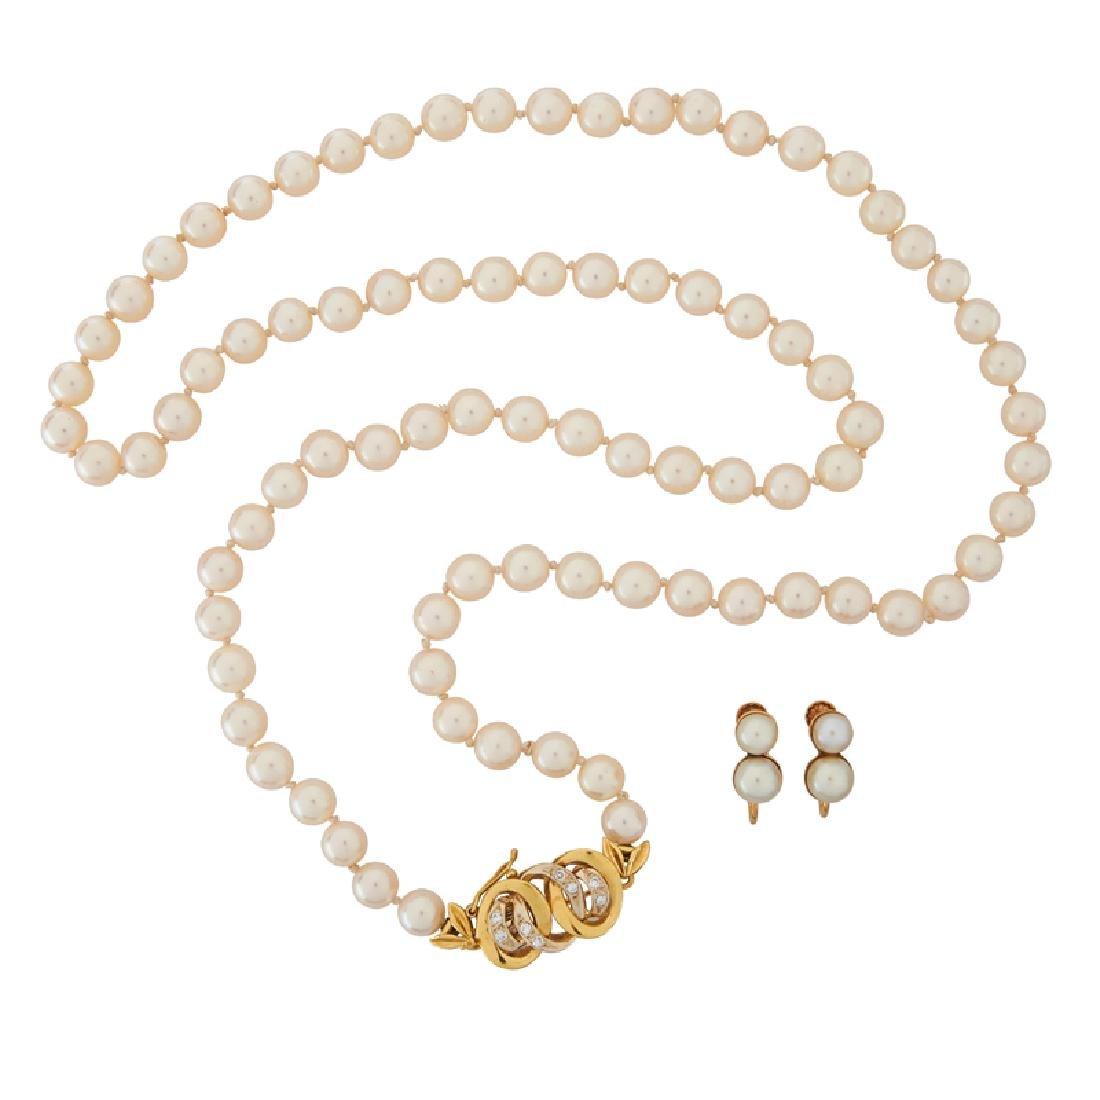 AKOYA PEARL & GOLD NECKLACE & EARRINGS, INCL. DIAMONDS